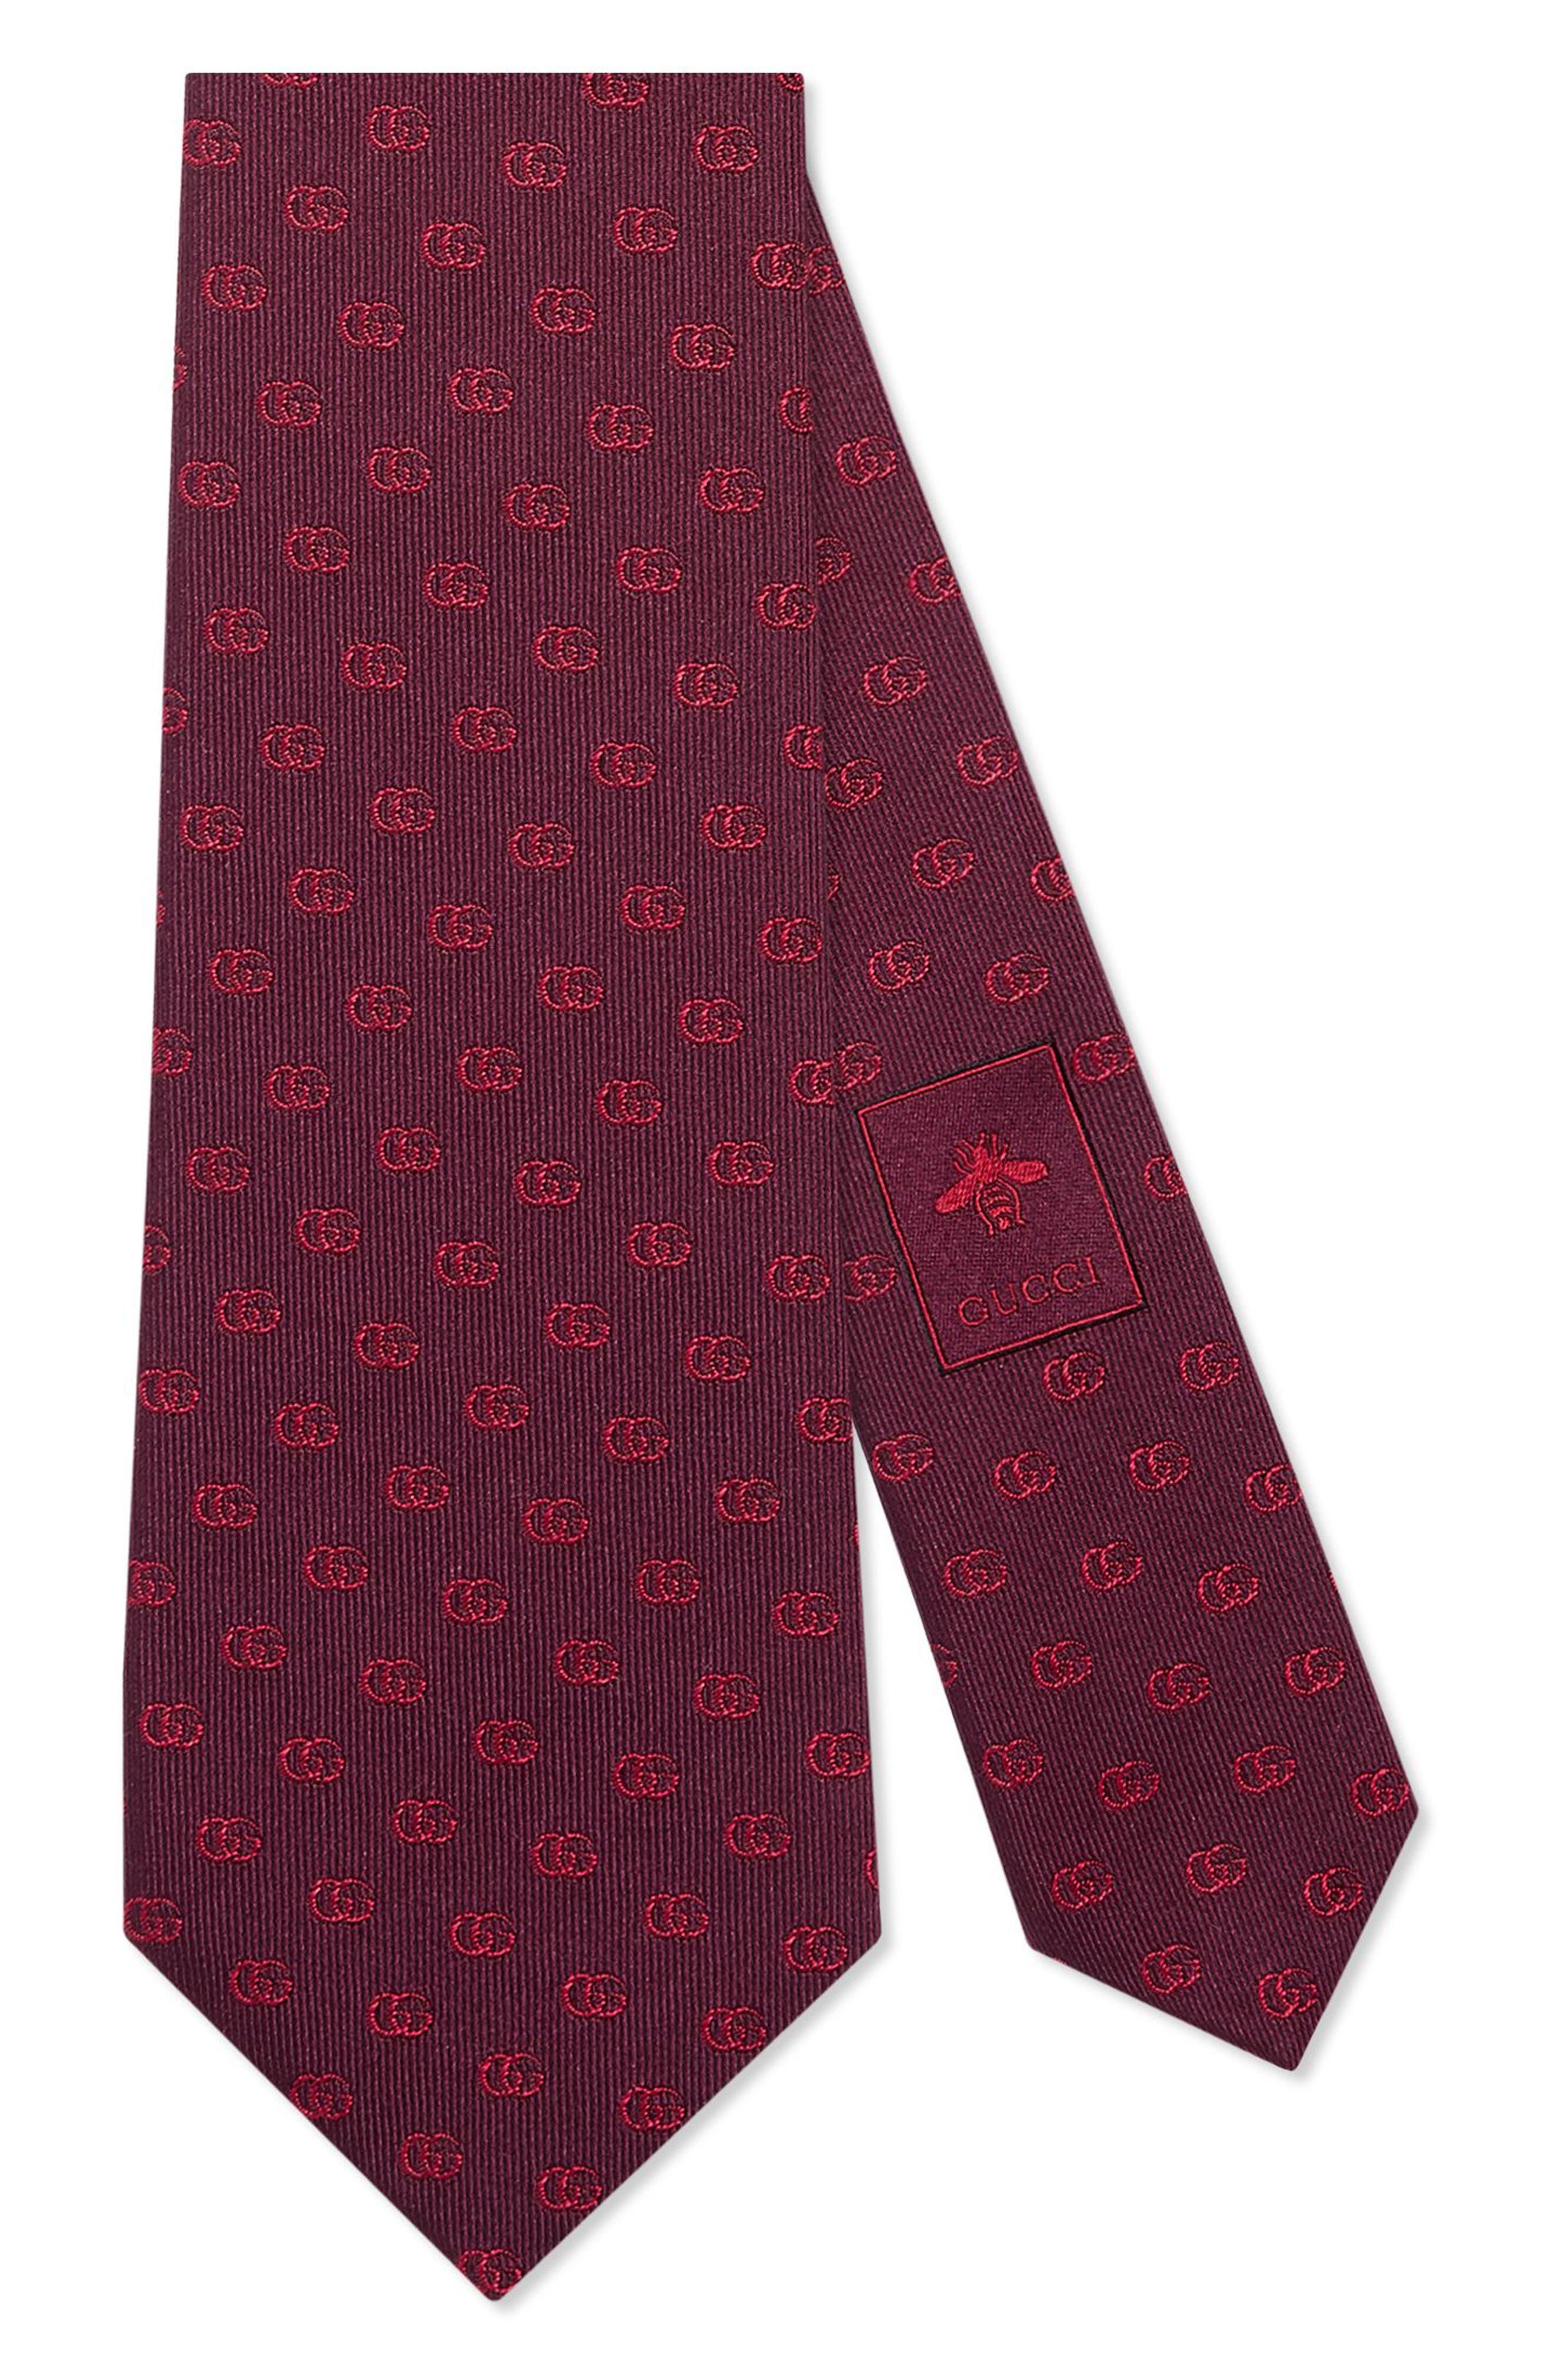 Alternate Image 1 Selected - Gucci Running Logo Silk Jacquard Tie